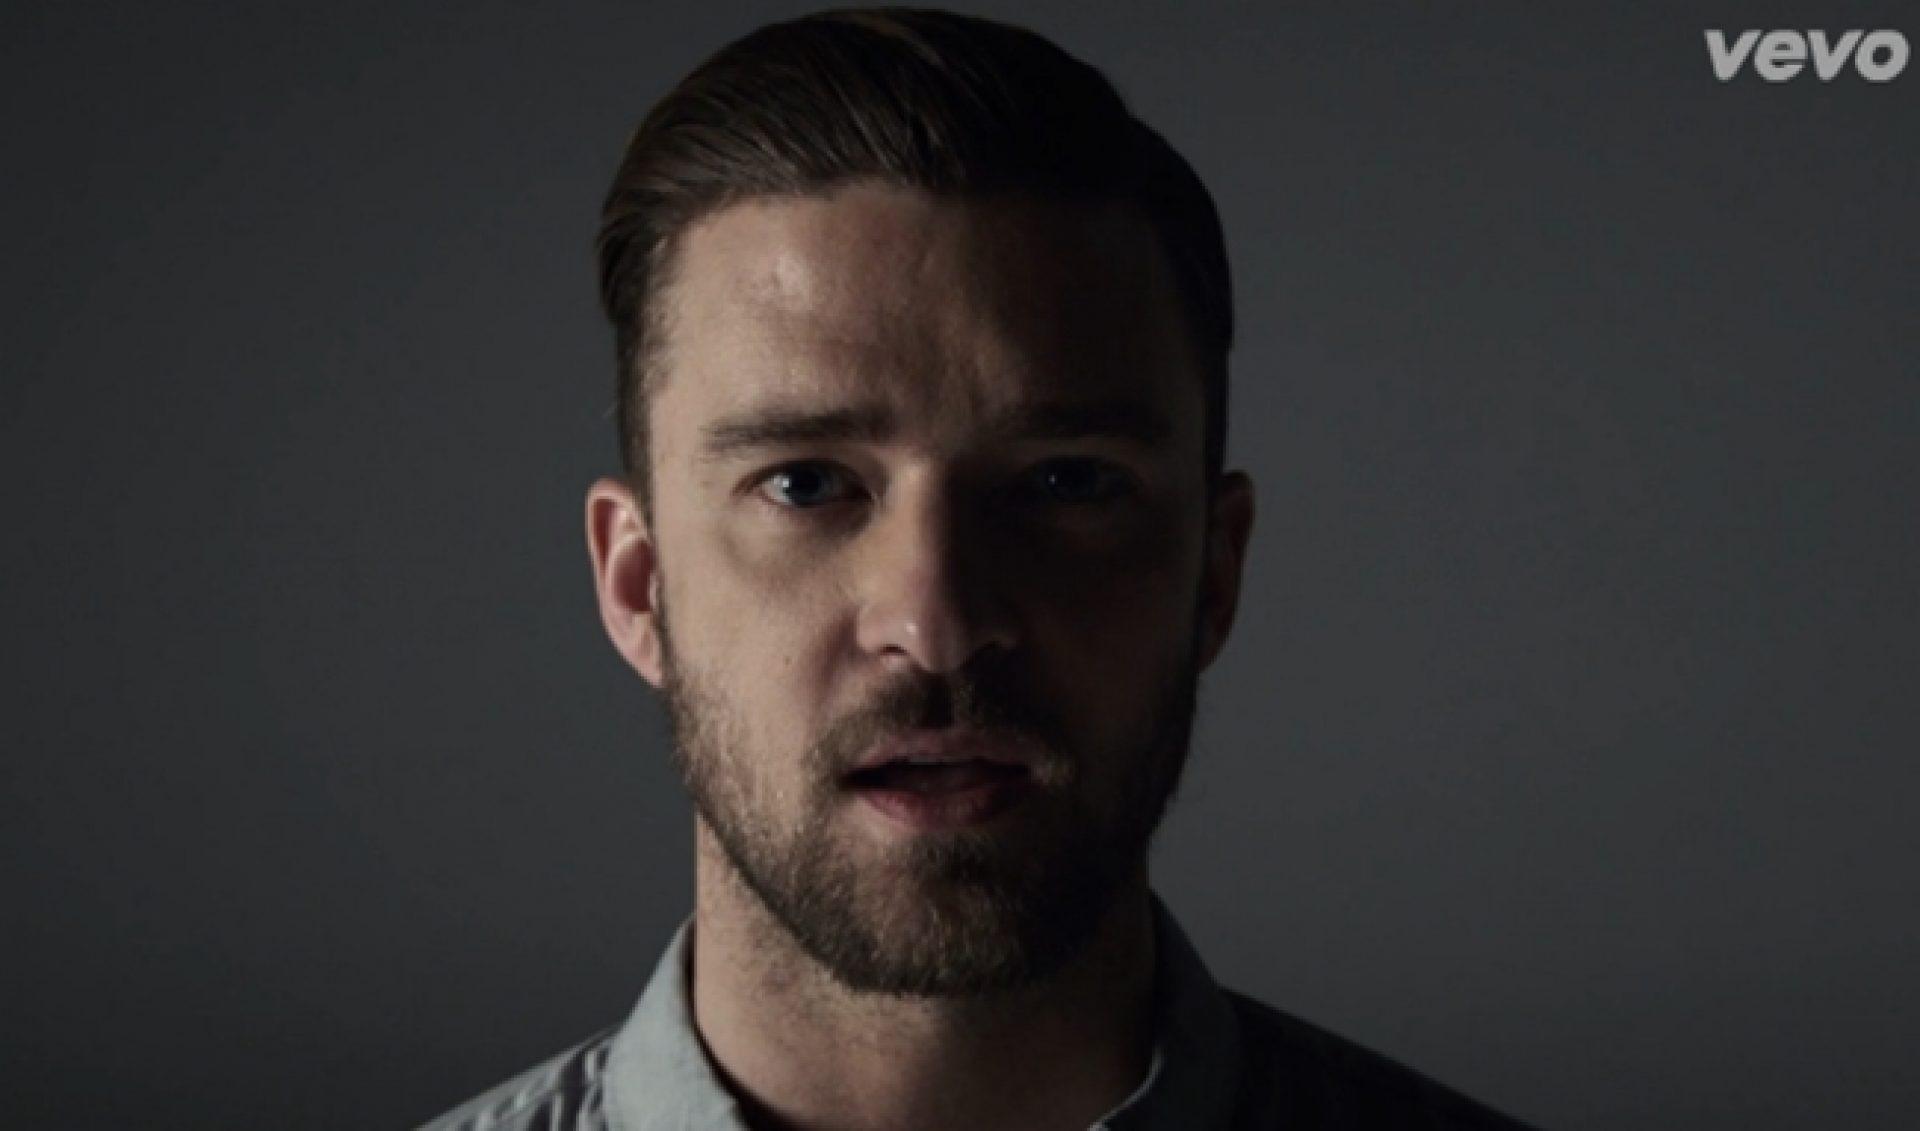 Justin Timberlake [Explicit] Tunnel Vision Video Returns